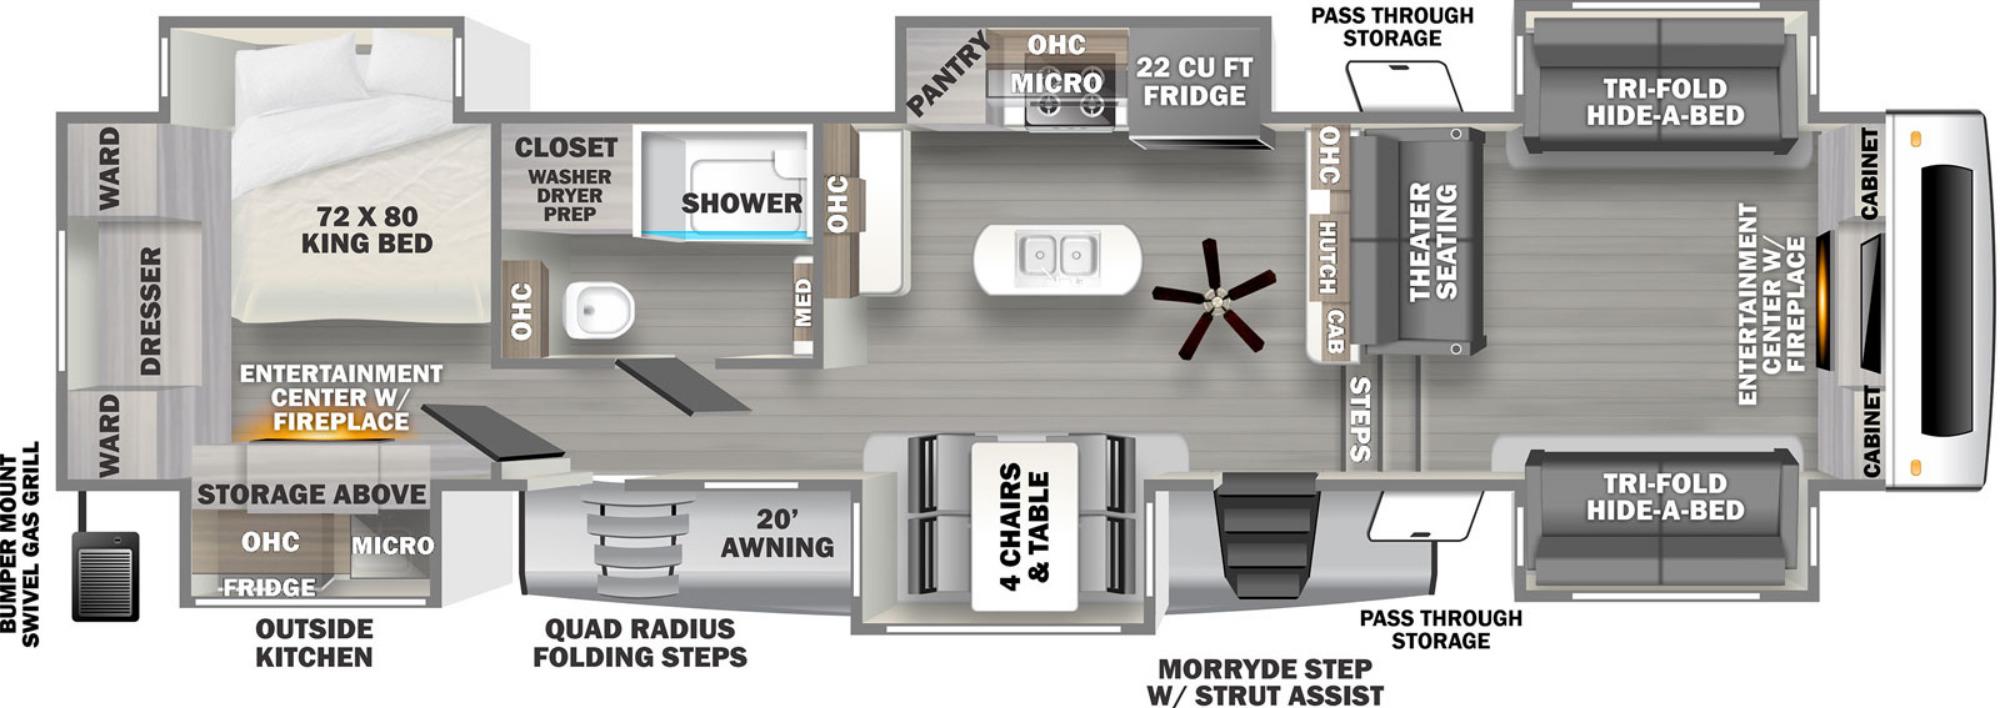 View Floor Plan for 2021 FOREST RIVER SANDPIPER LUXURY 379FLOK